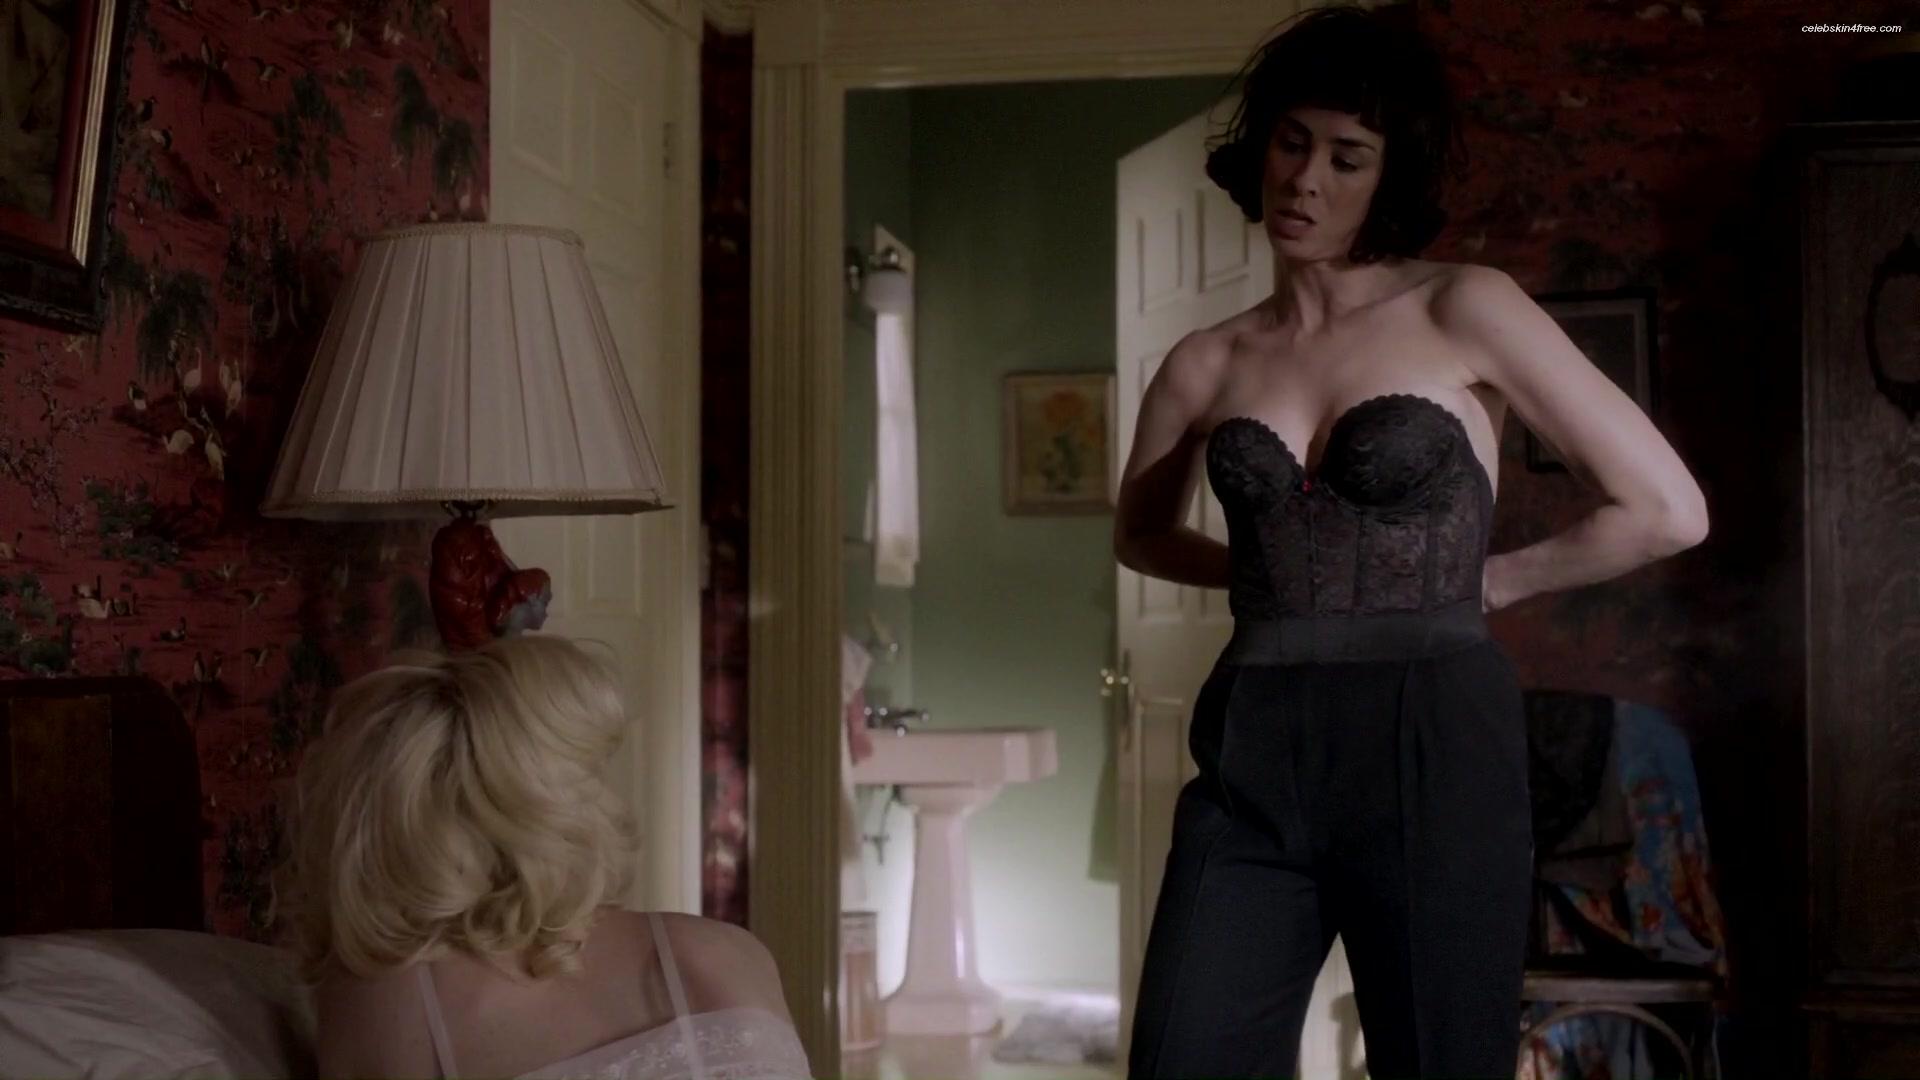 Spears upskirt pussy